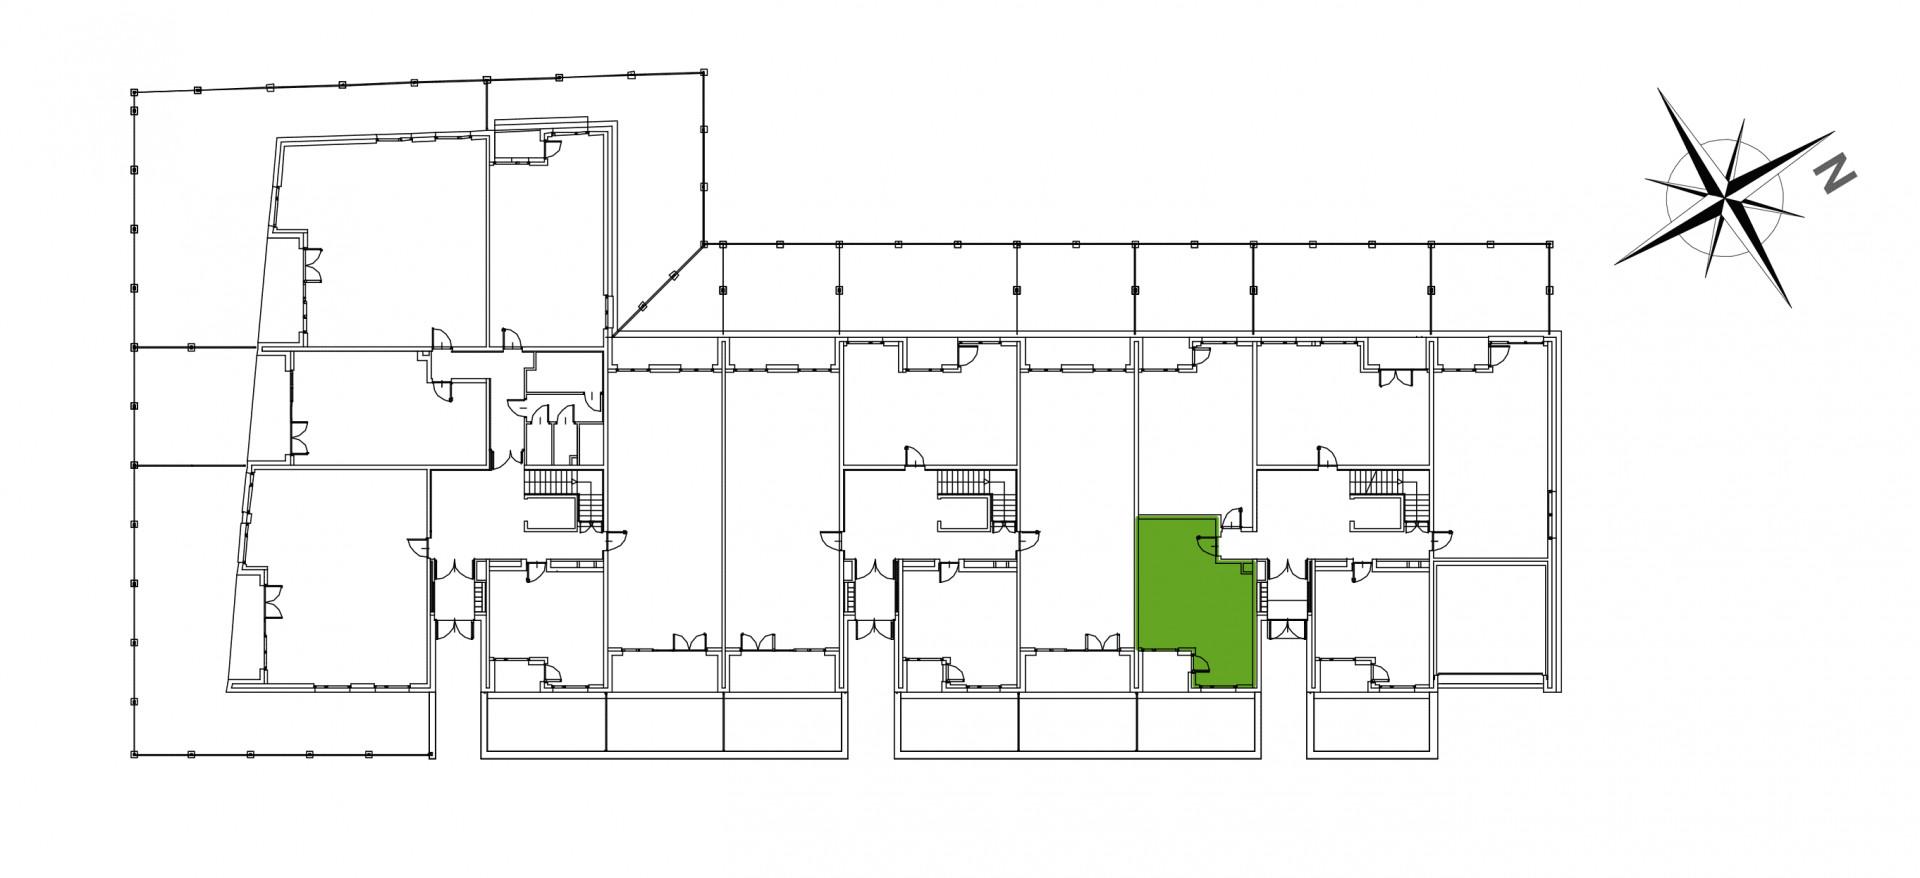 Mazowiecka 72 / apartament nr 1 rzut 2